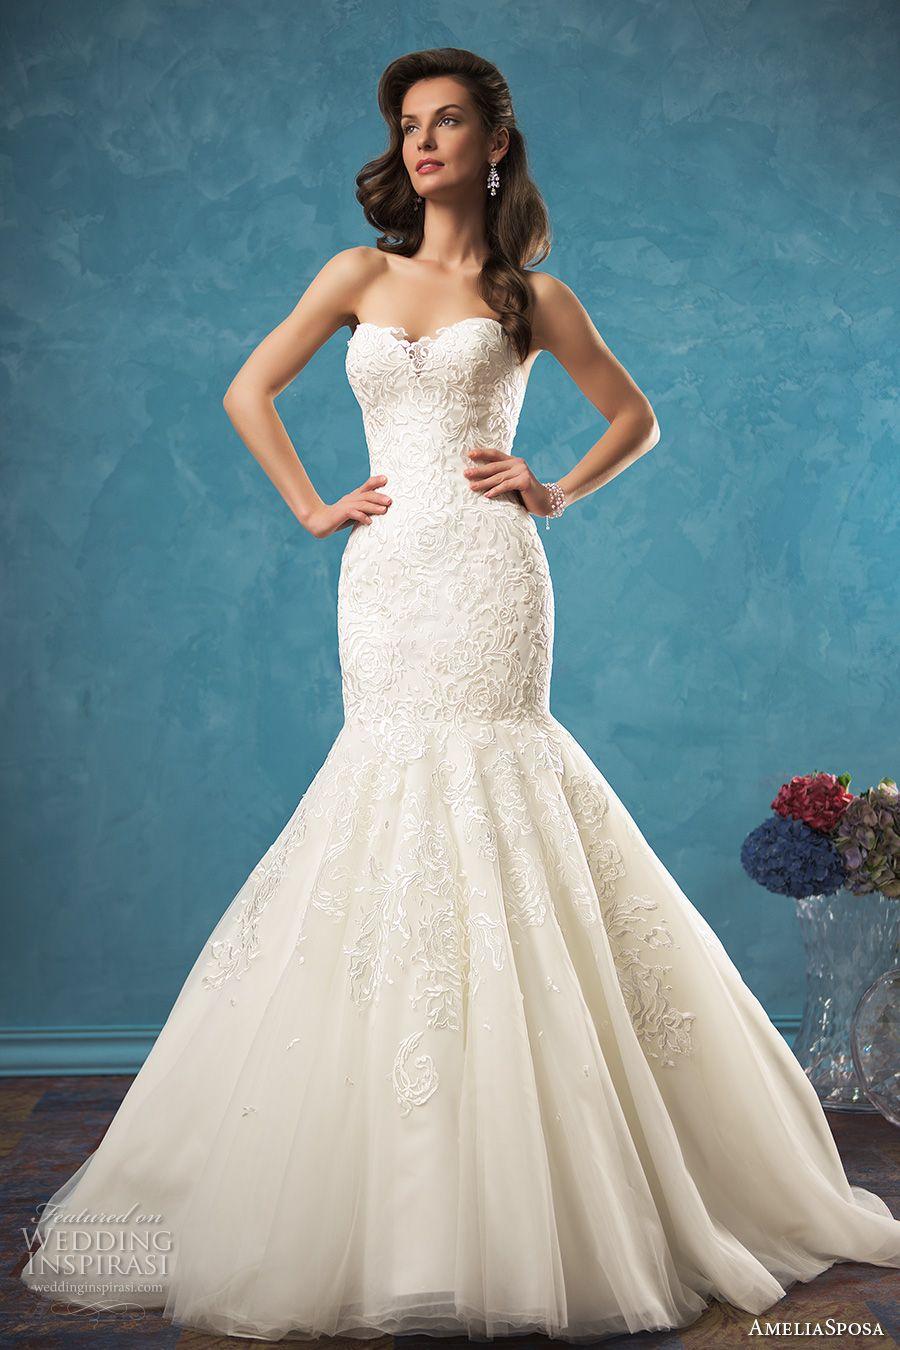 Amelia Sposa 2017 Wedding Dresses | Amelia sposa, Cathedral train ...